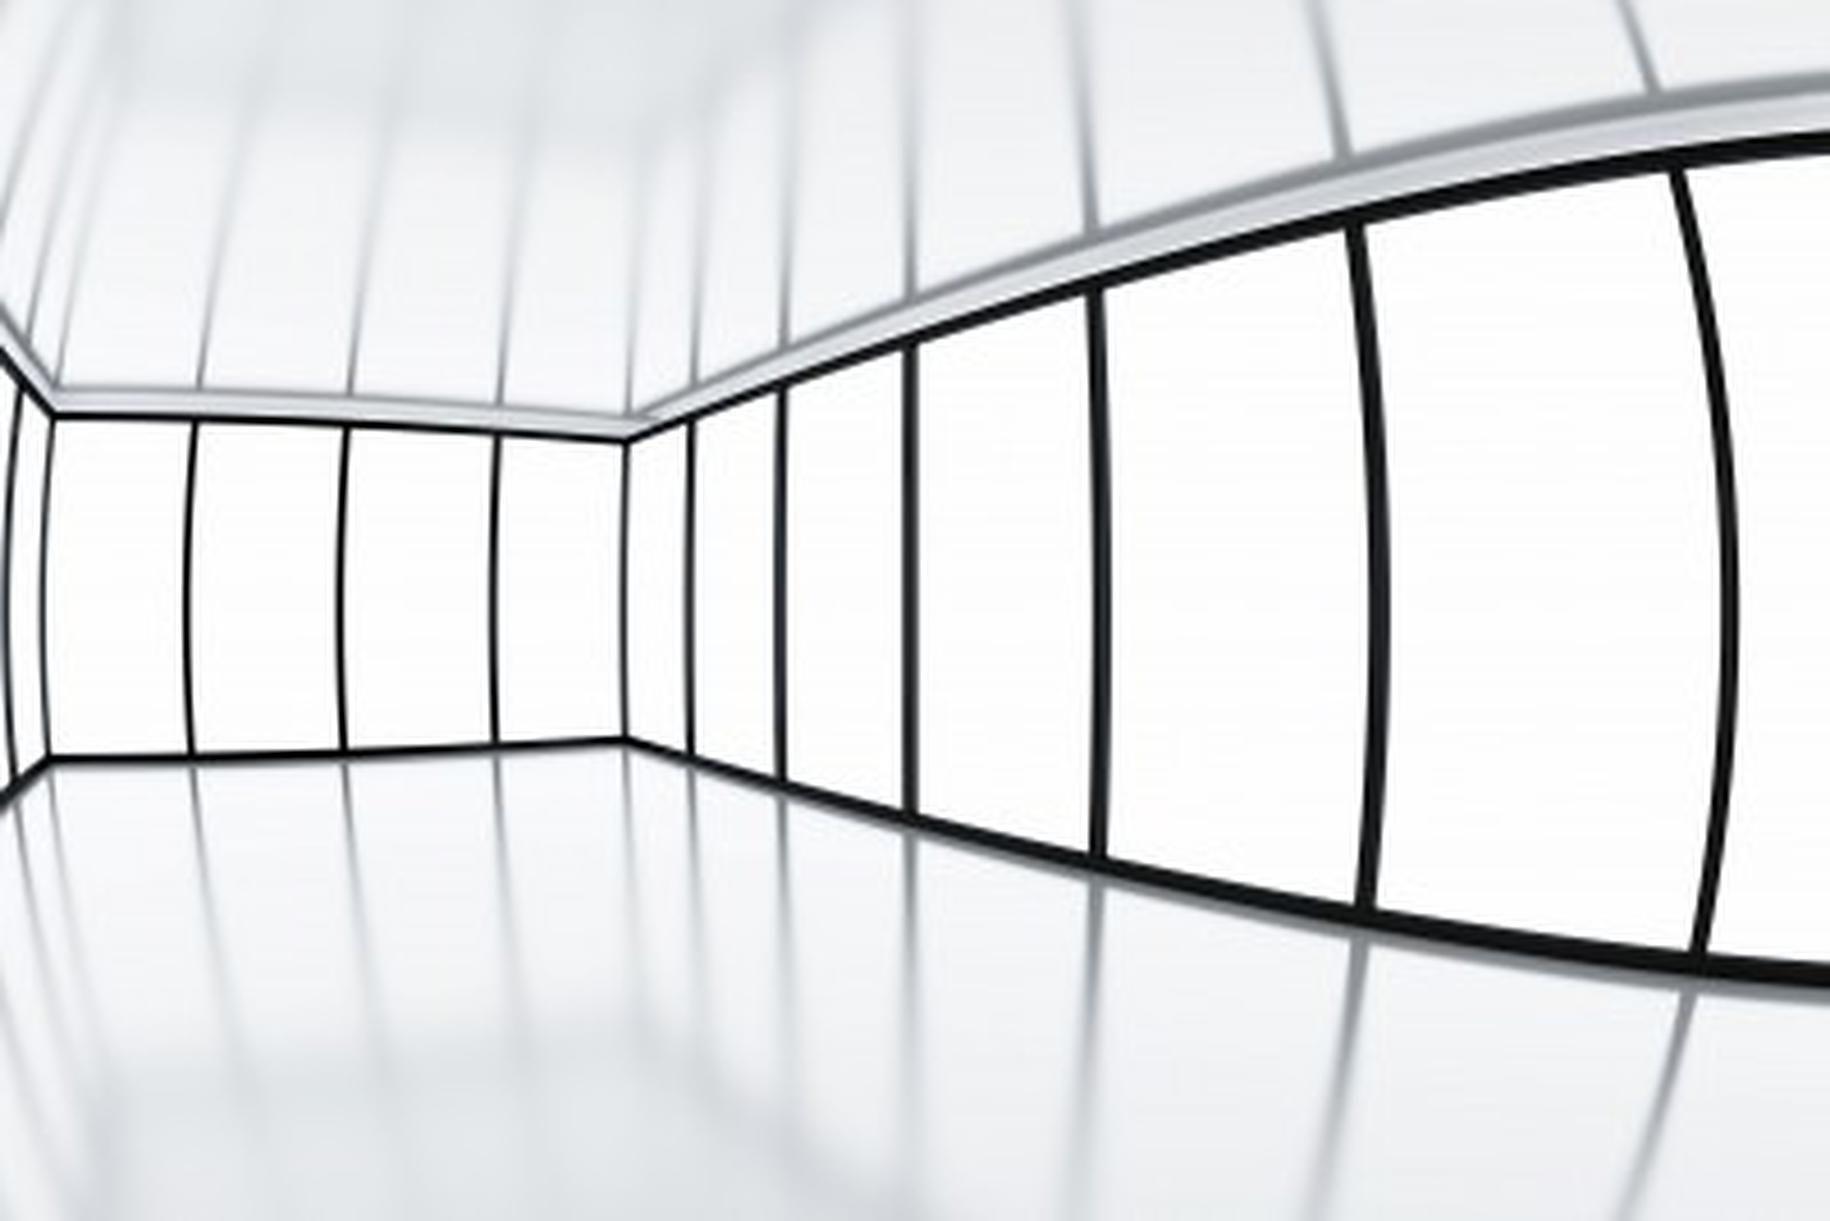 Invisishade Switchable Privacy Film Smart Windows Privacy Film Windows Windows Doors